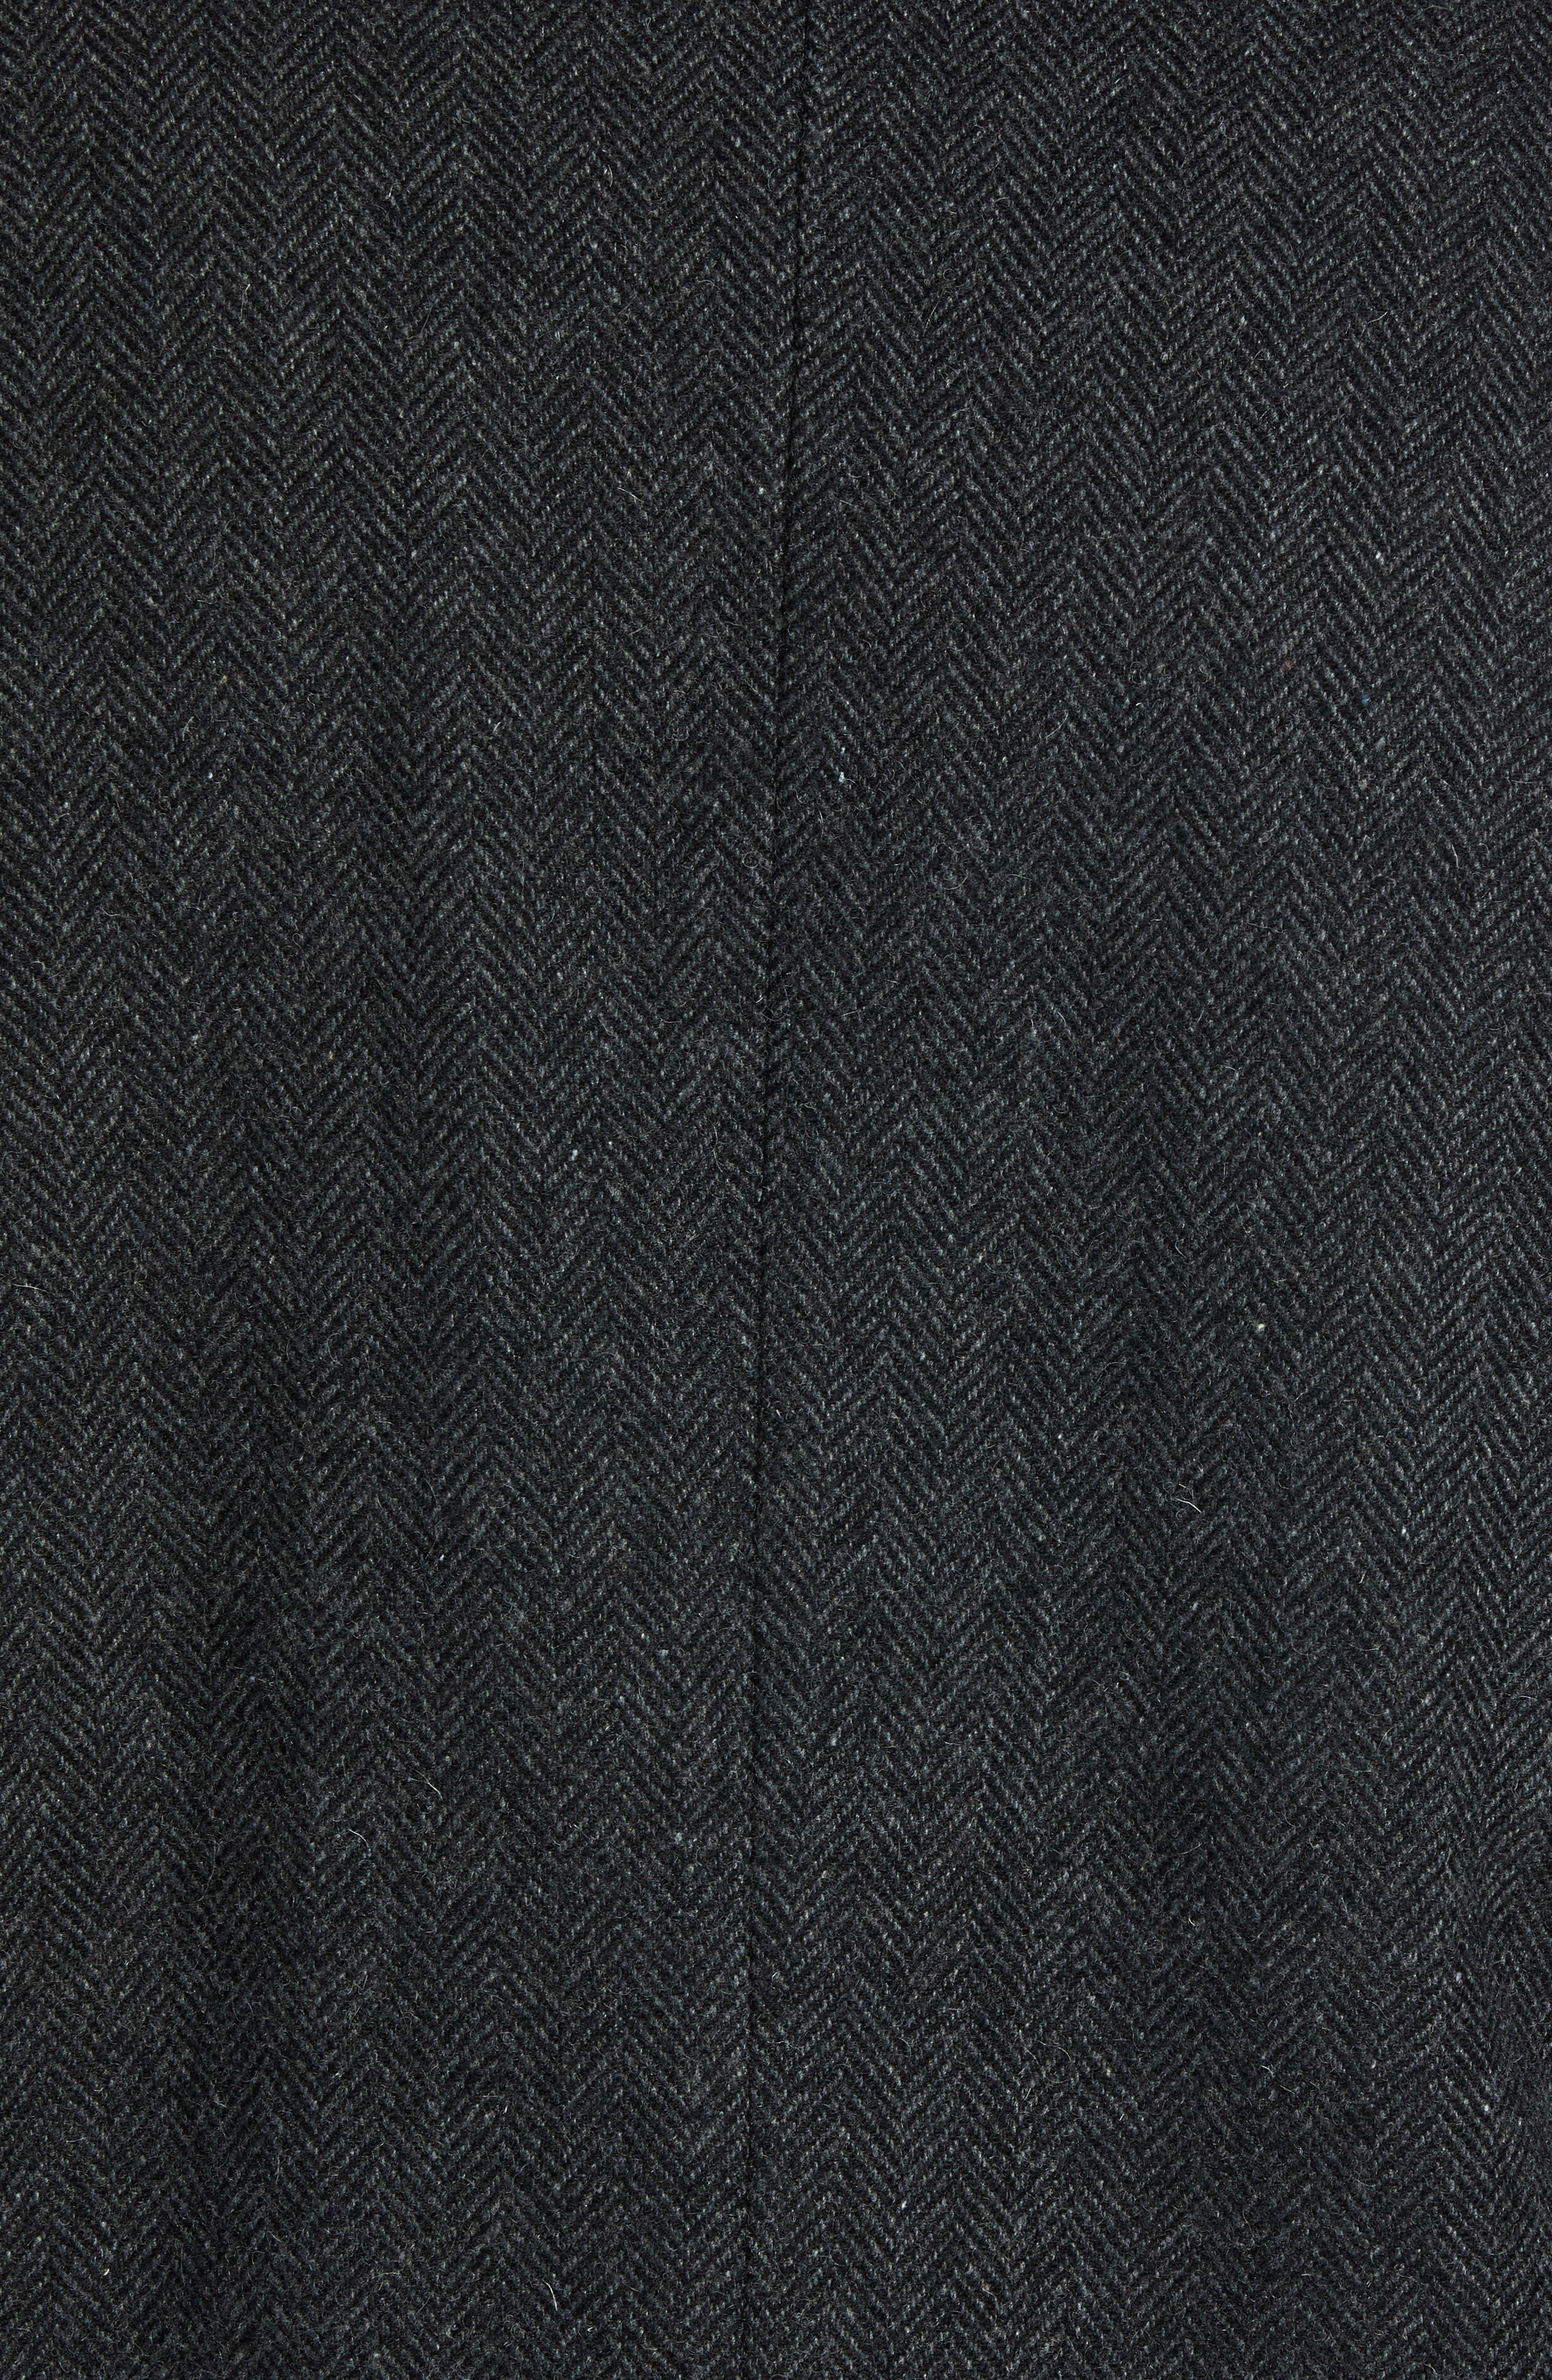 PENDLETON, Iconic Textures Manhattan Wool Blend Top Coat, Alternate thumbnail 7, color, CHARCOAL HERRINGBONE